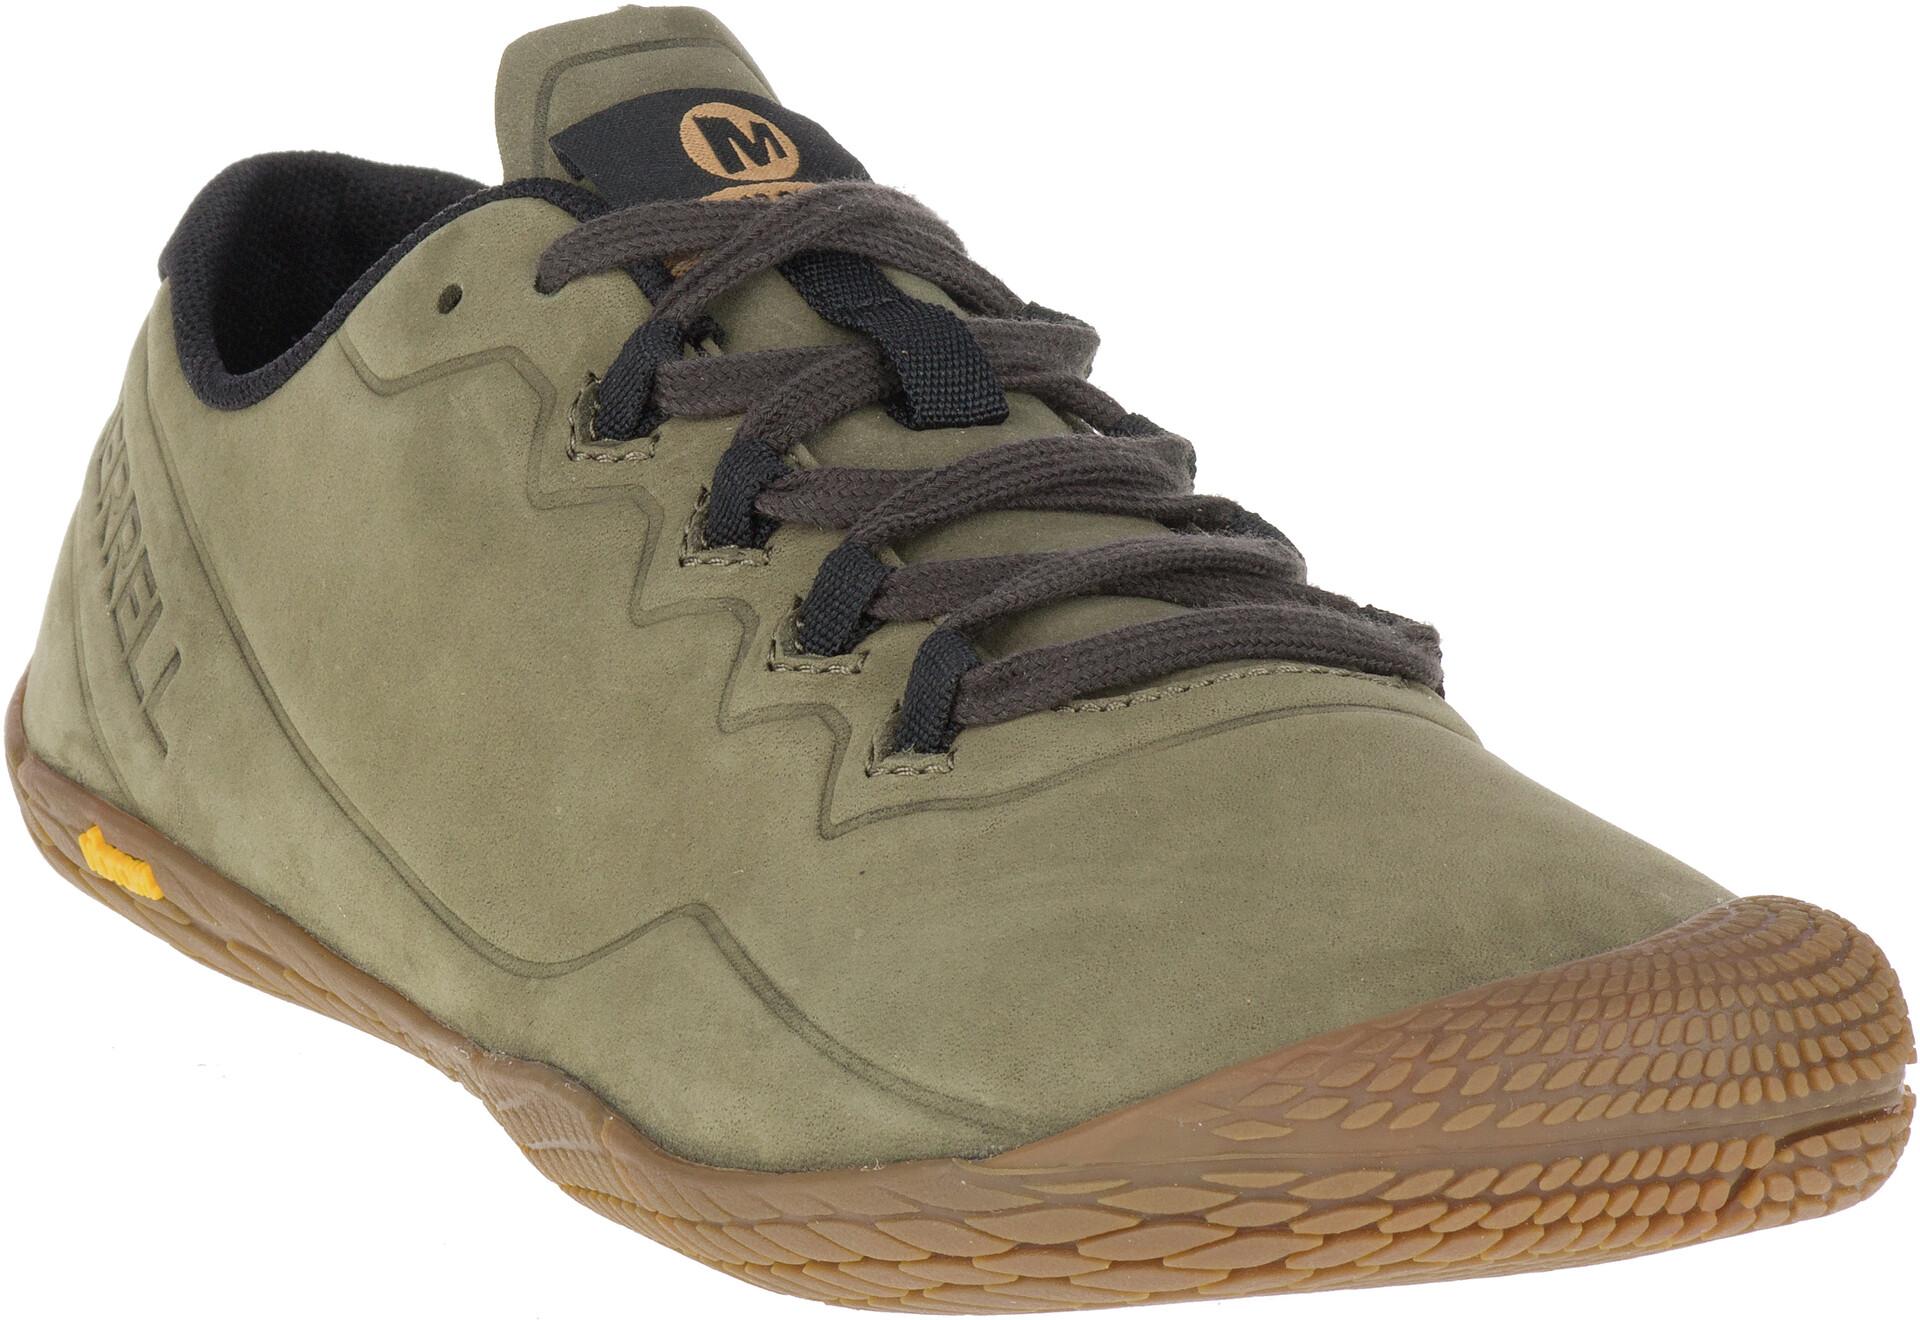 Merrell Vapor Glove 3 Luna LTR Shoes Herren dusty olive